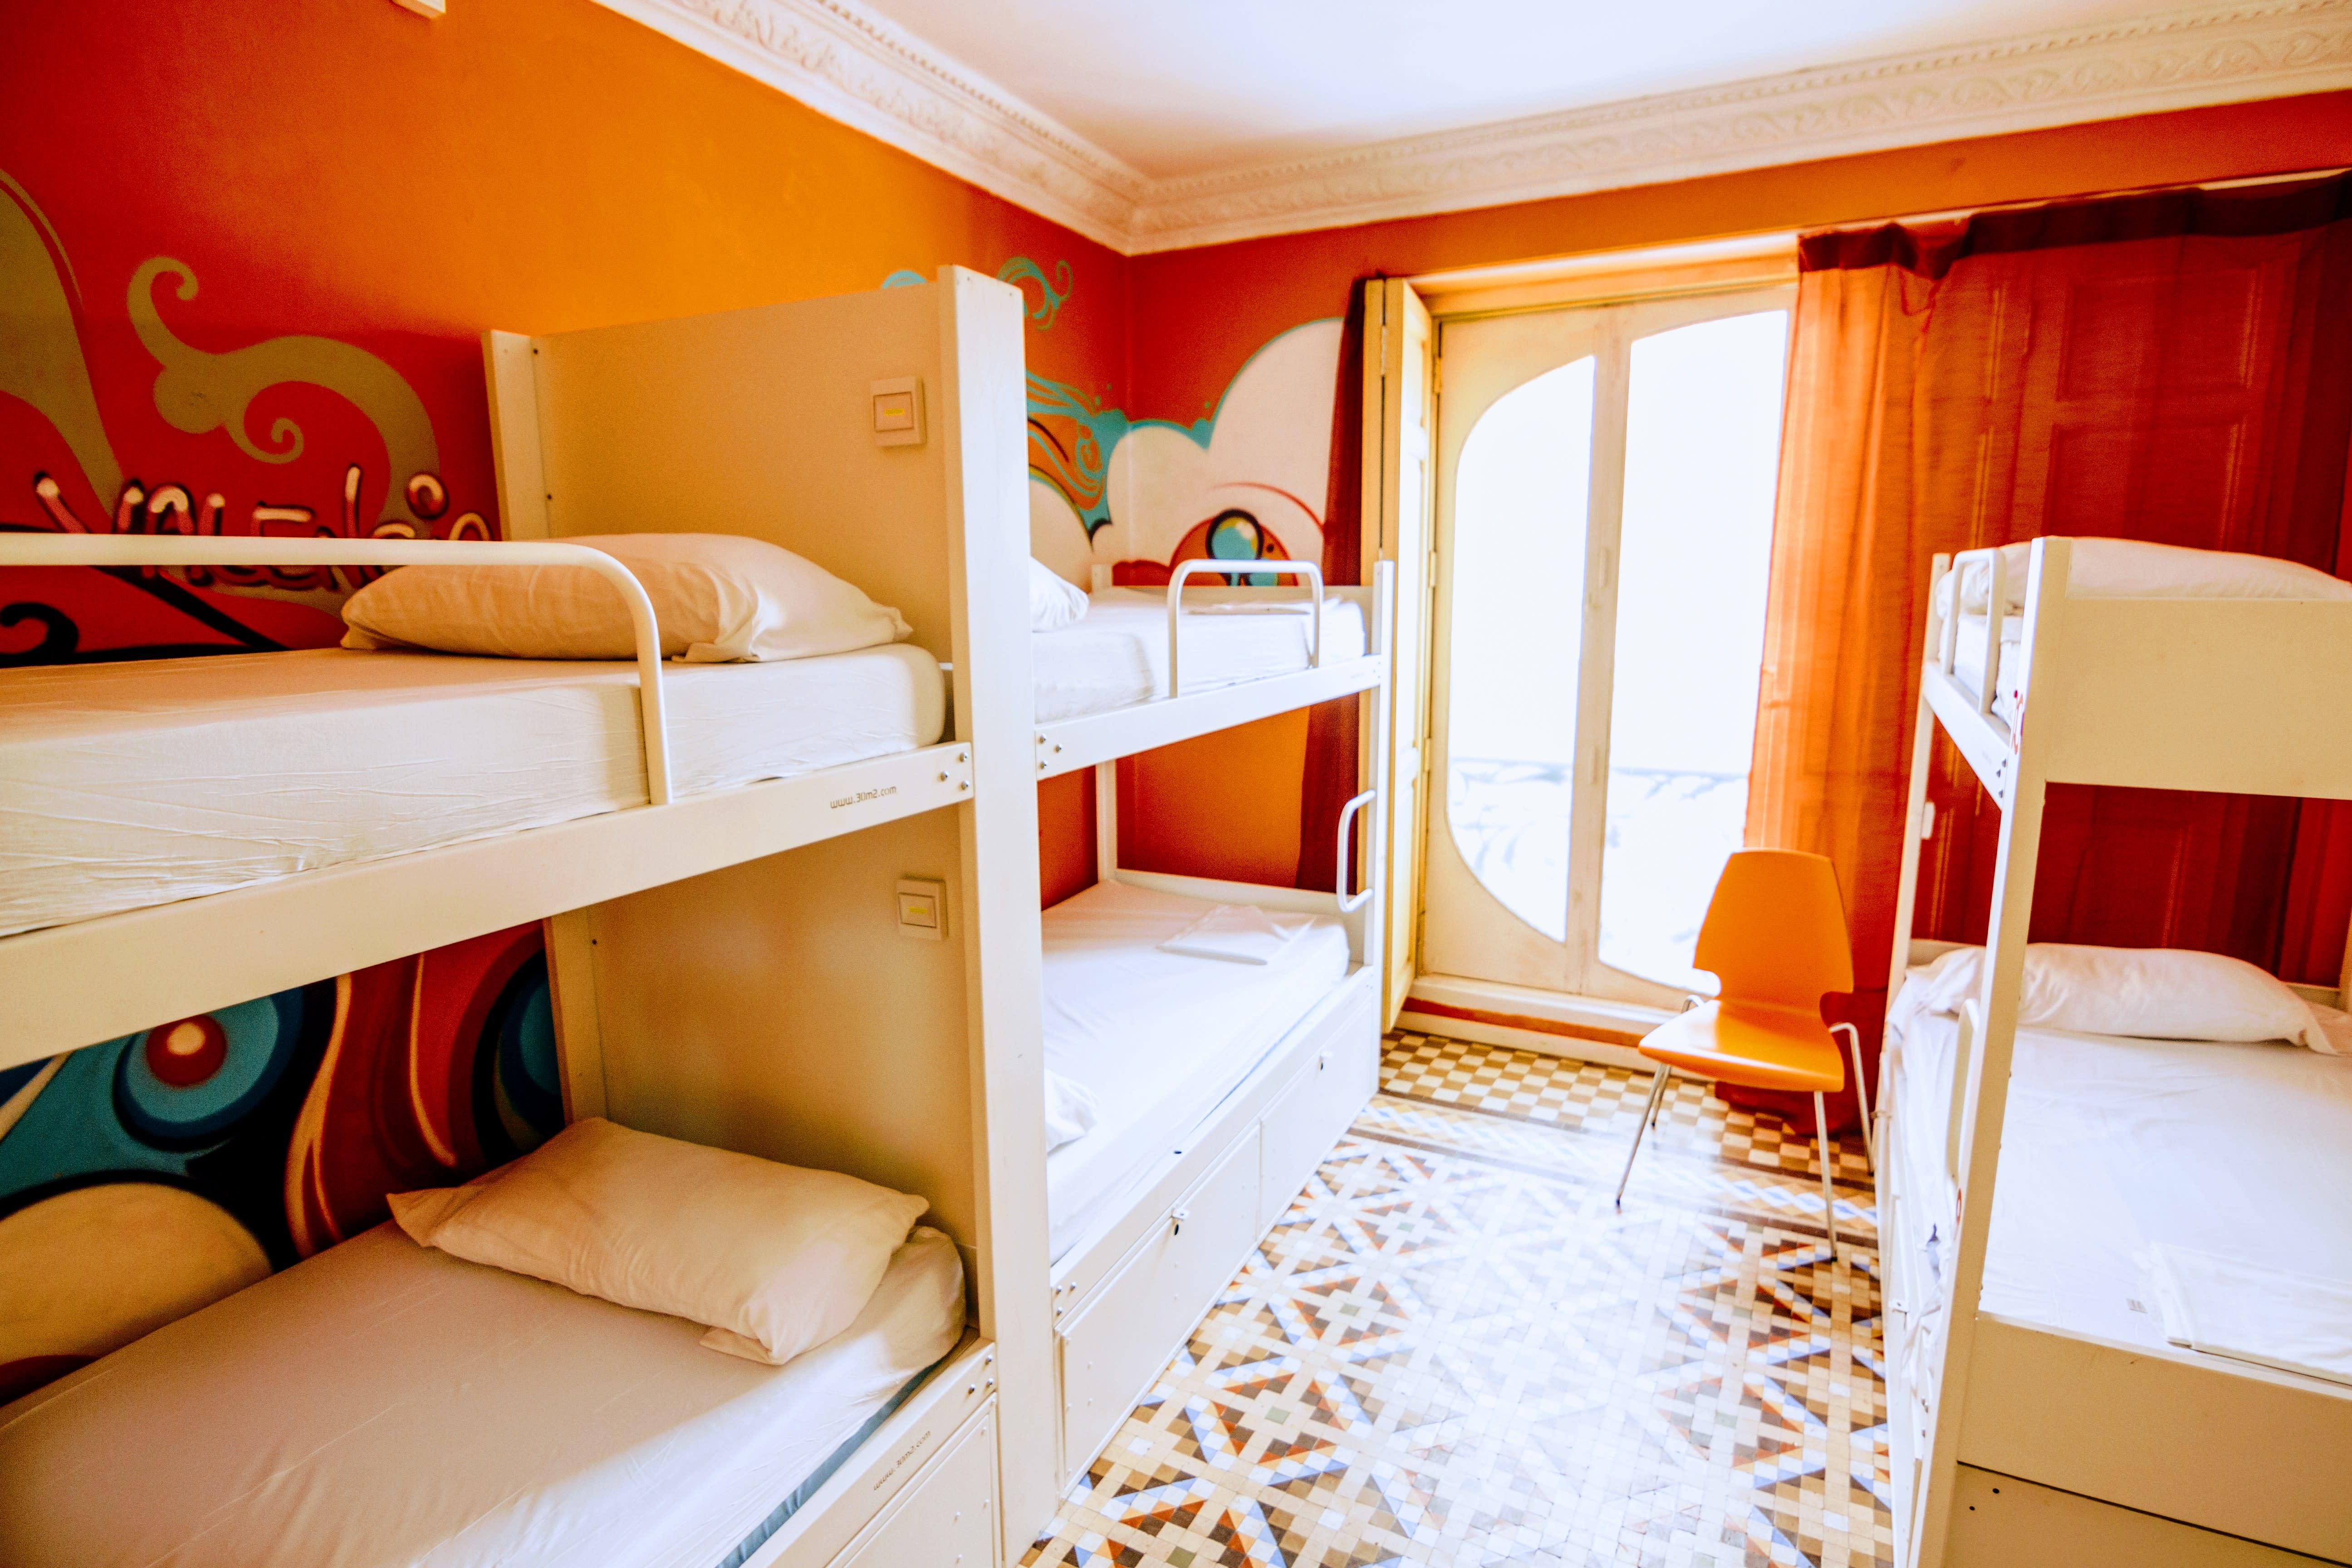 Red Nest Hostel Valencia